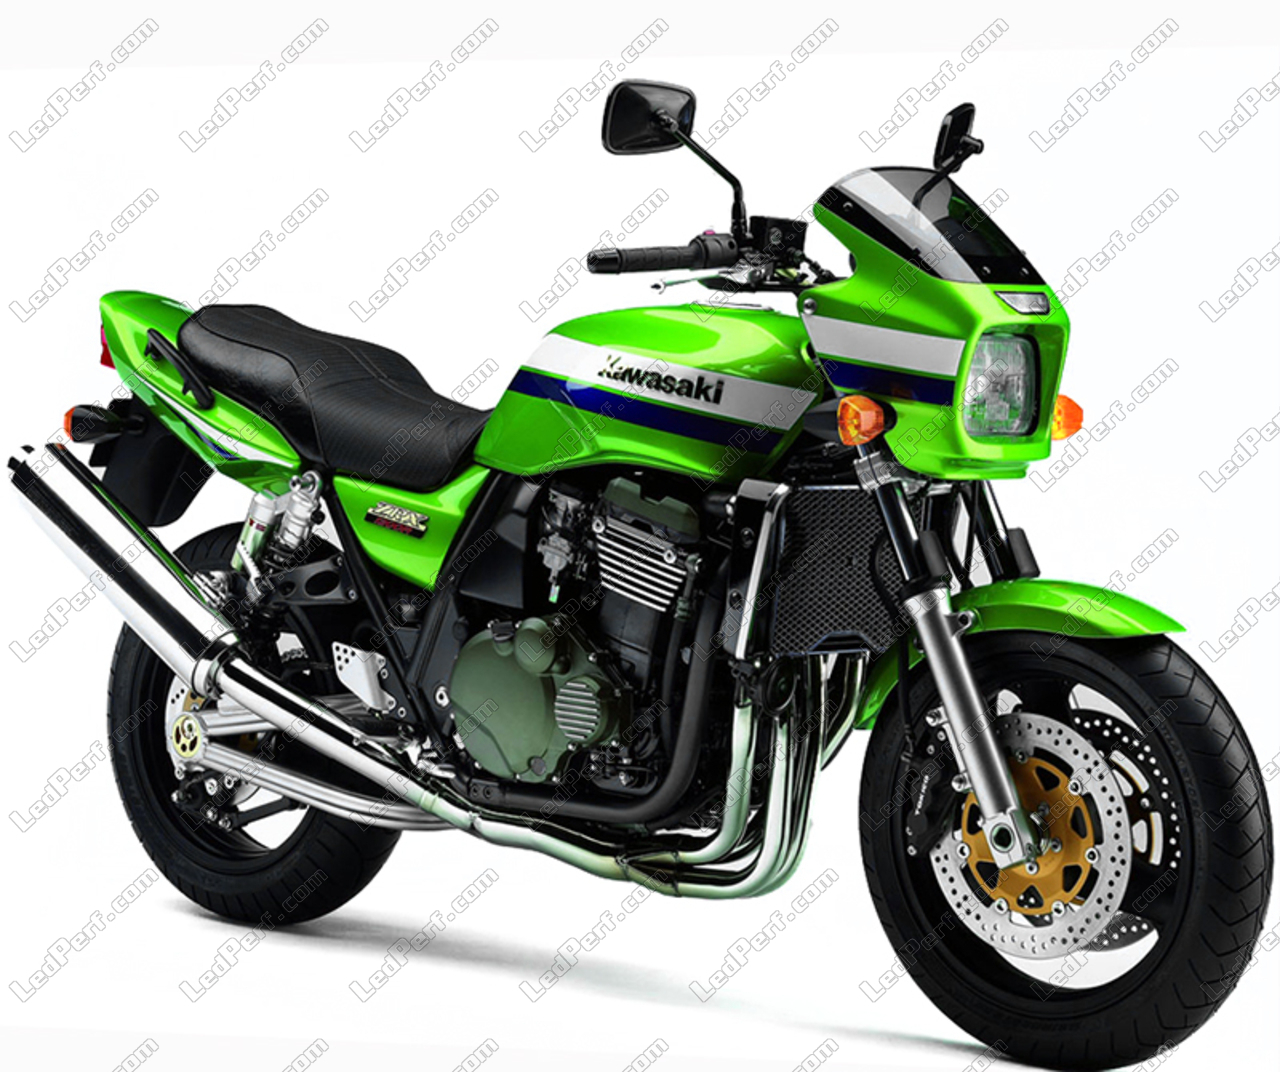 Kawasaki Zrx 1200 R Canbus Bi Xenon Hid Conversion Kit 4300k 5000k Wiring Diagram Packs Par Marque Moto Scooter Quad Ssv Spyder Led